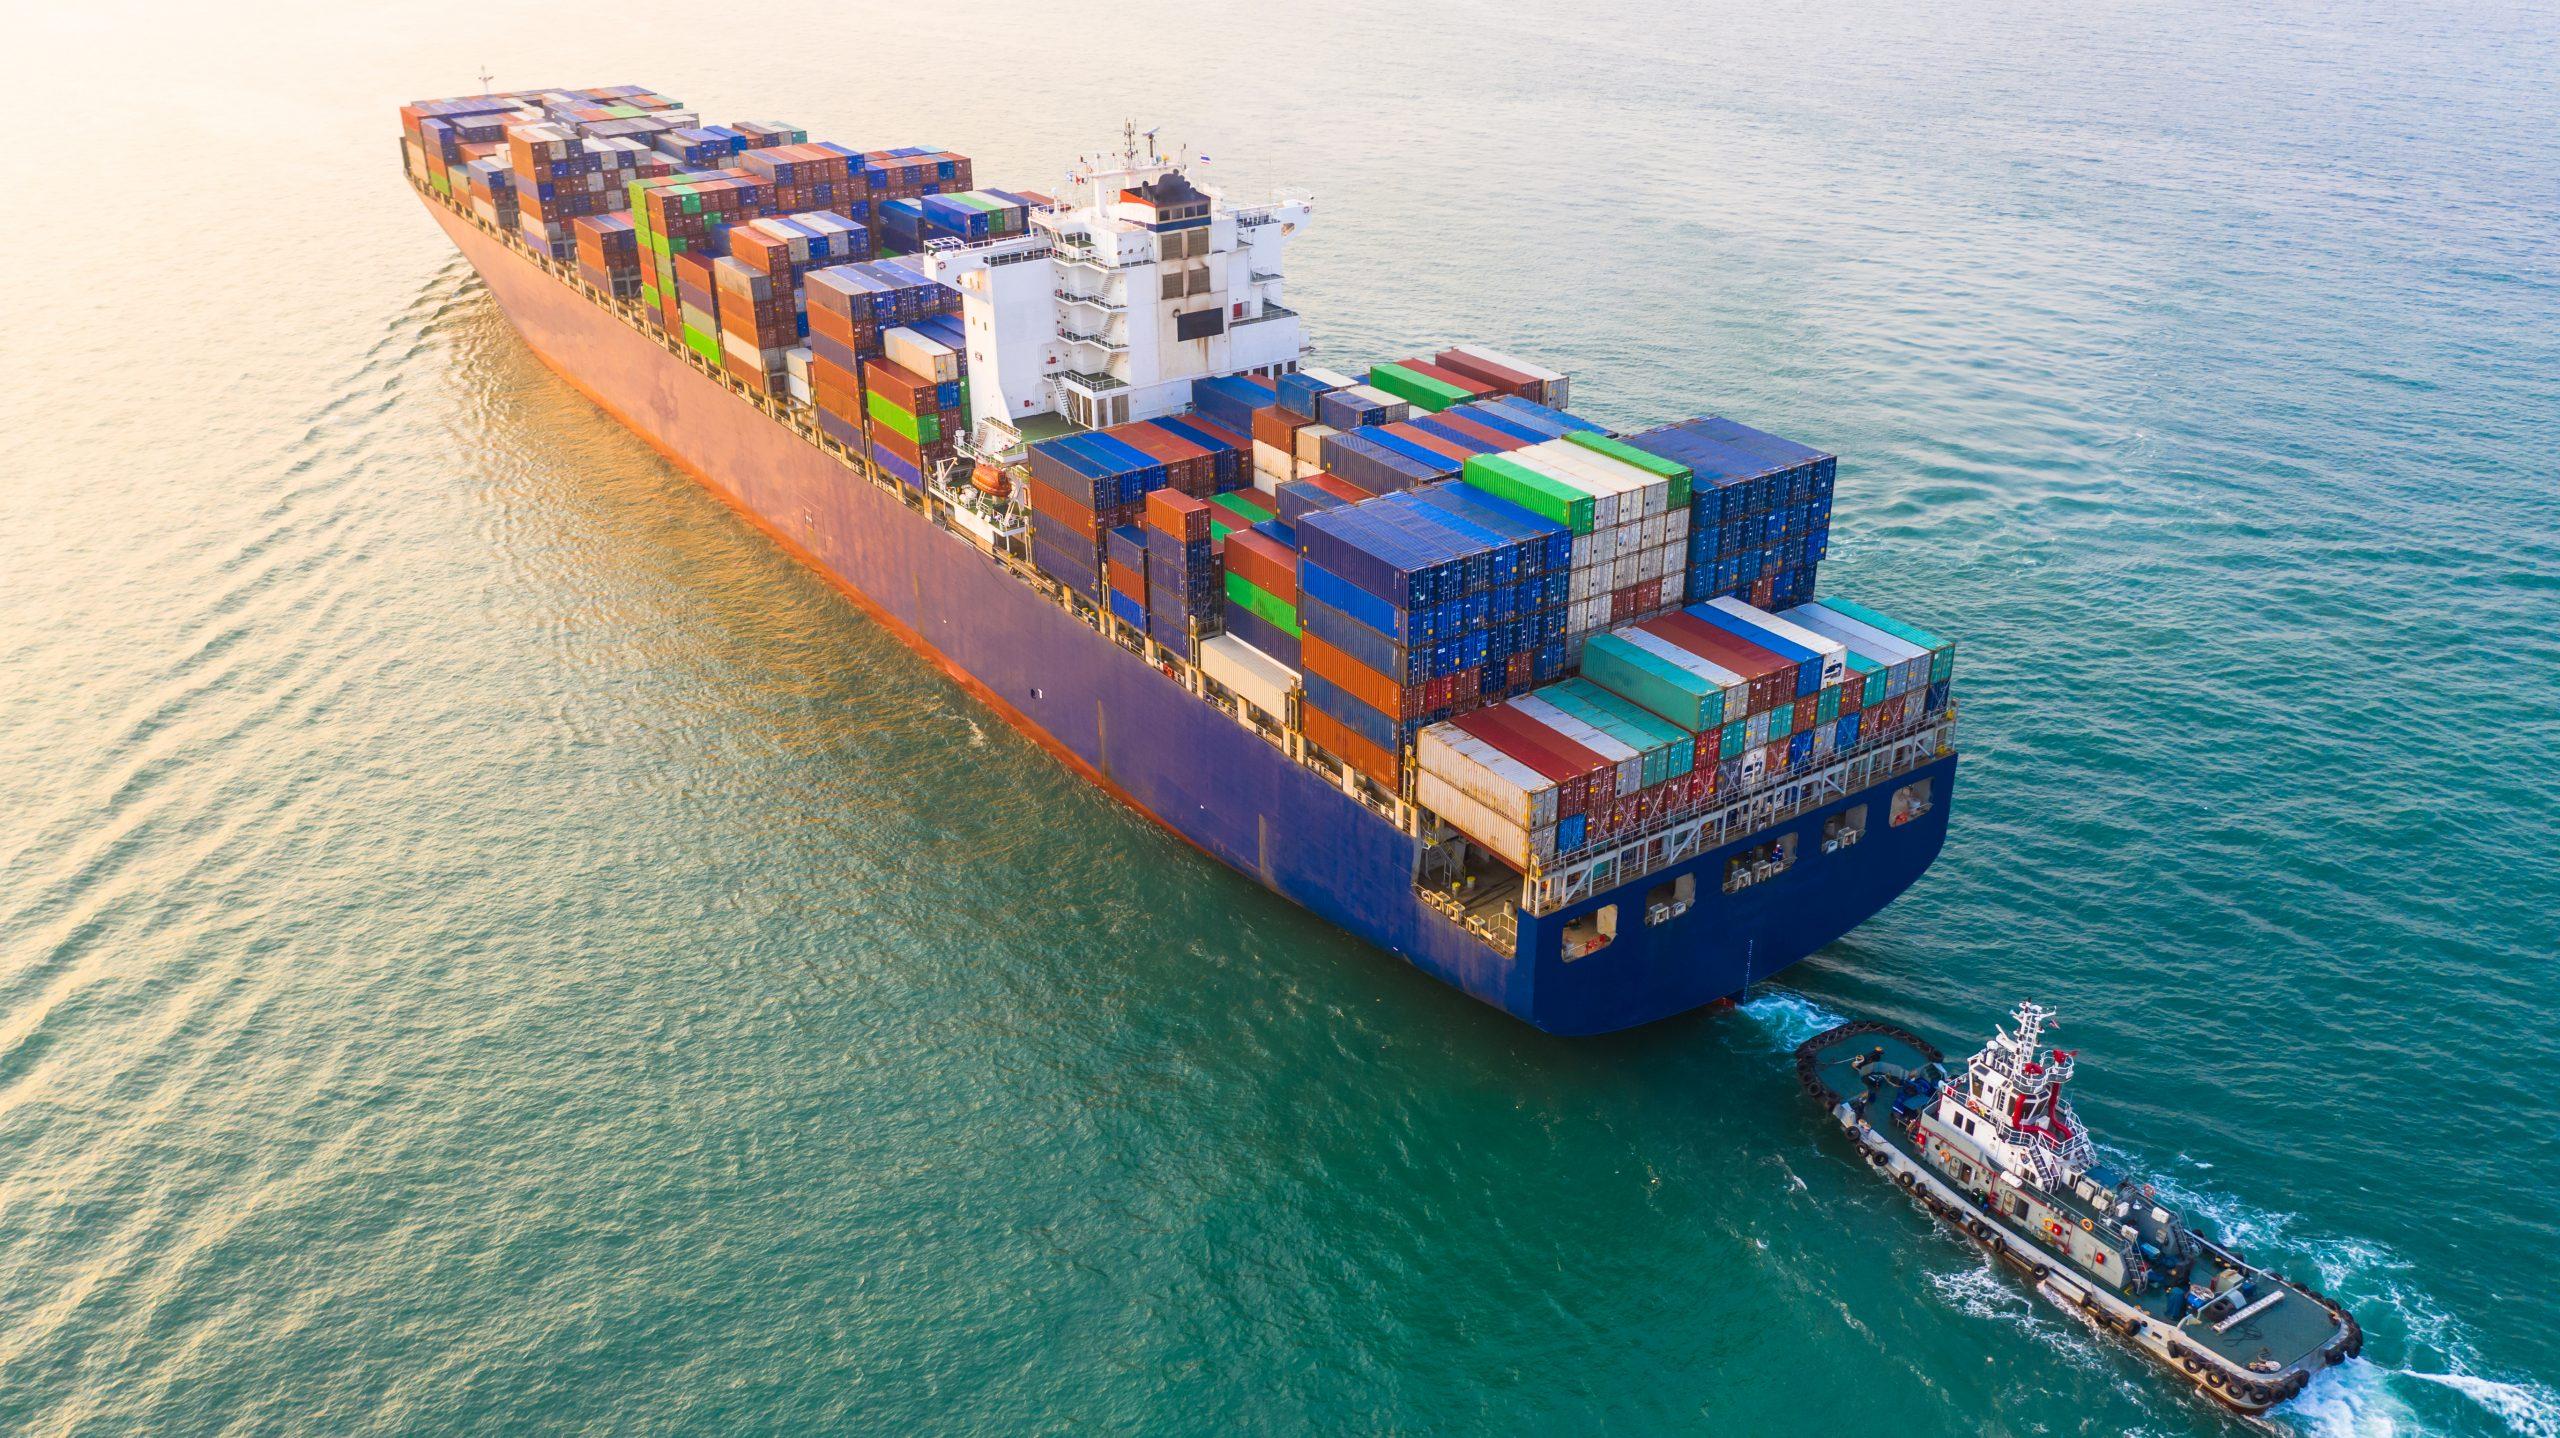 Freight Forwarders: 6 Tips to Get Through Peak Shipping Season